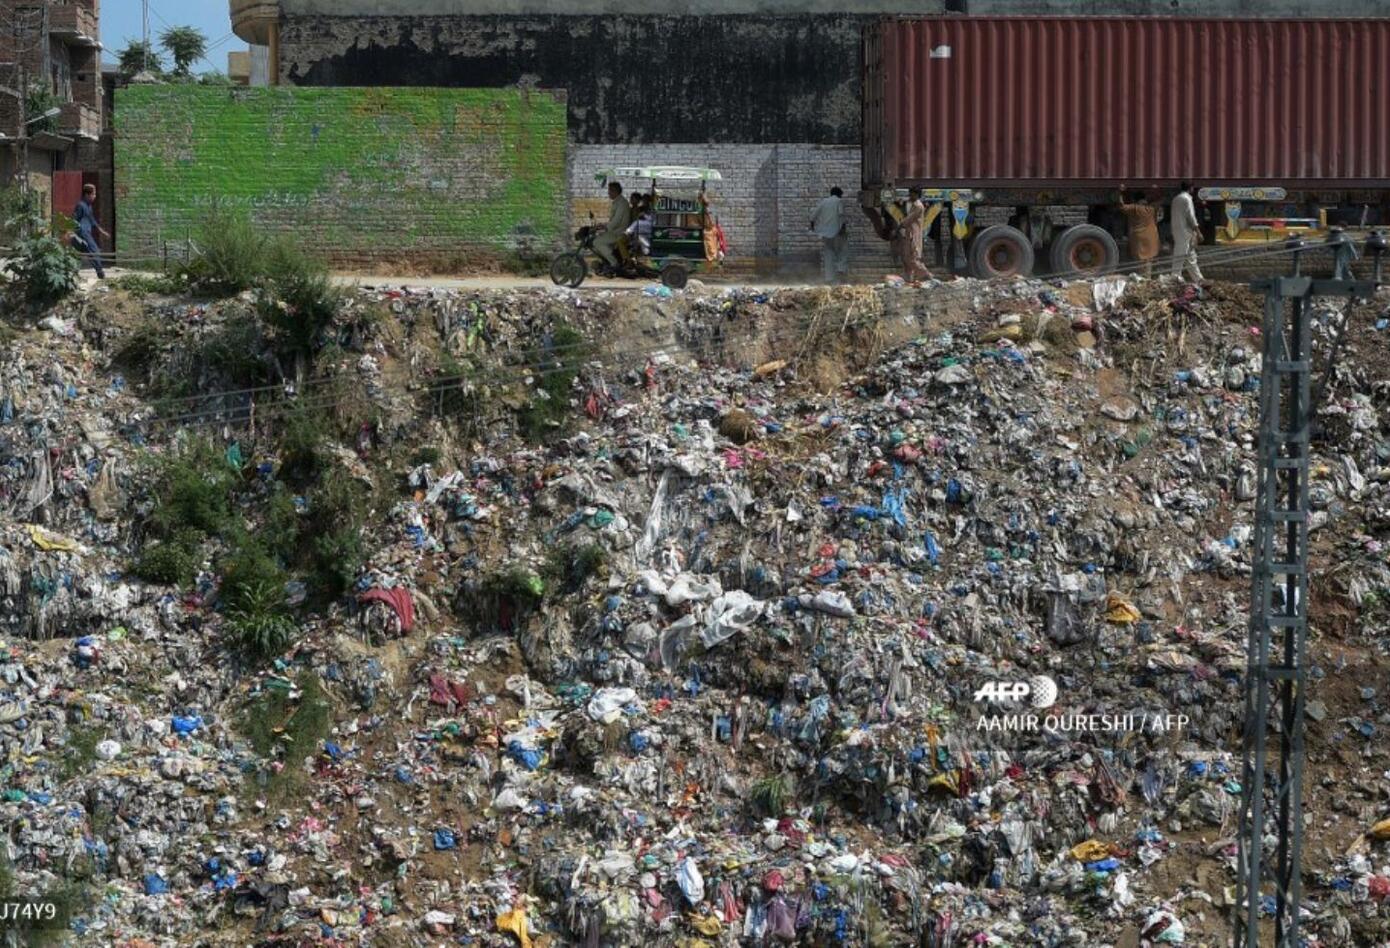 Cada año se producen 55.000 millones de bolsas en Pakistán